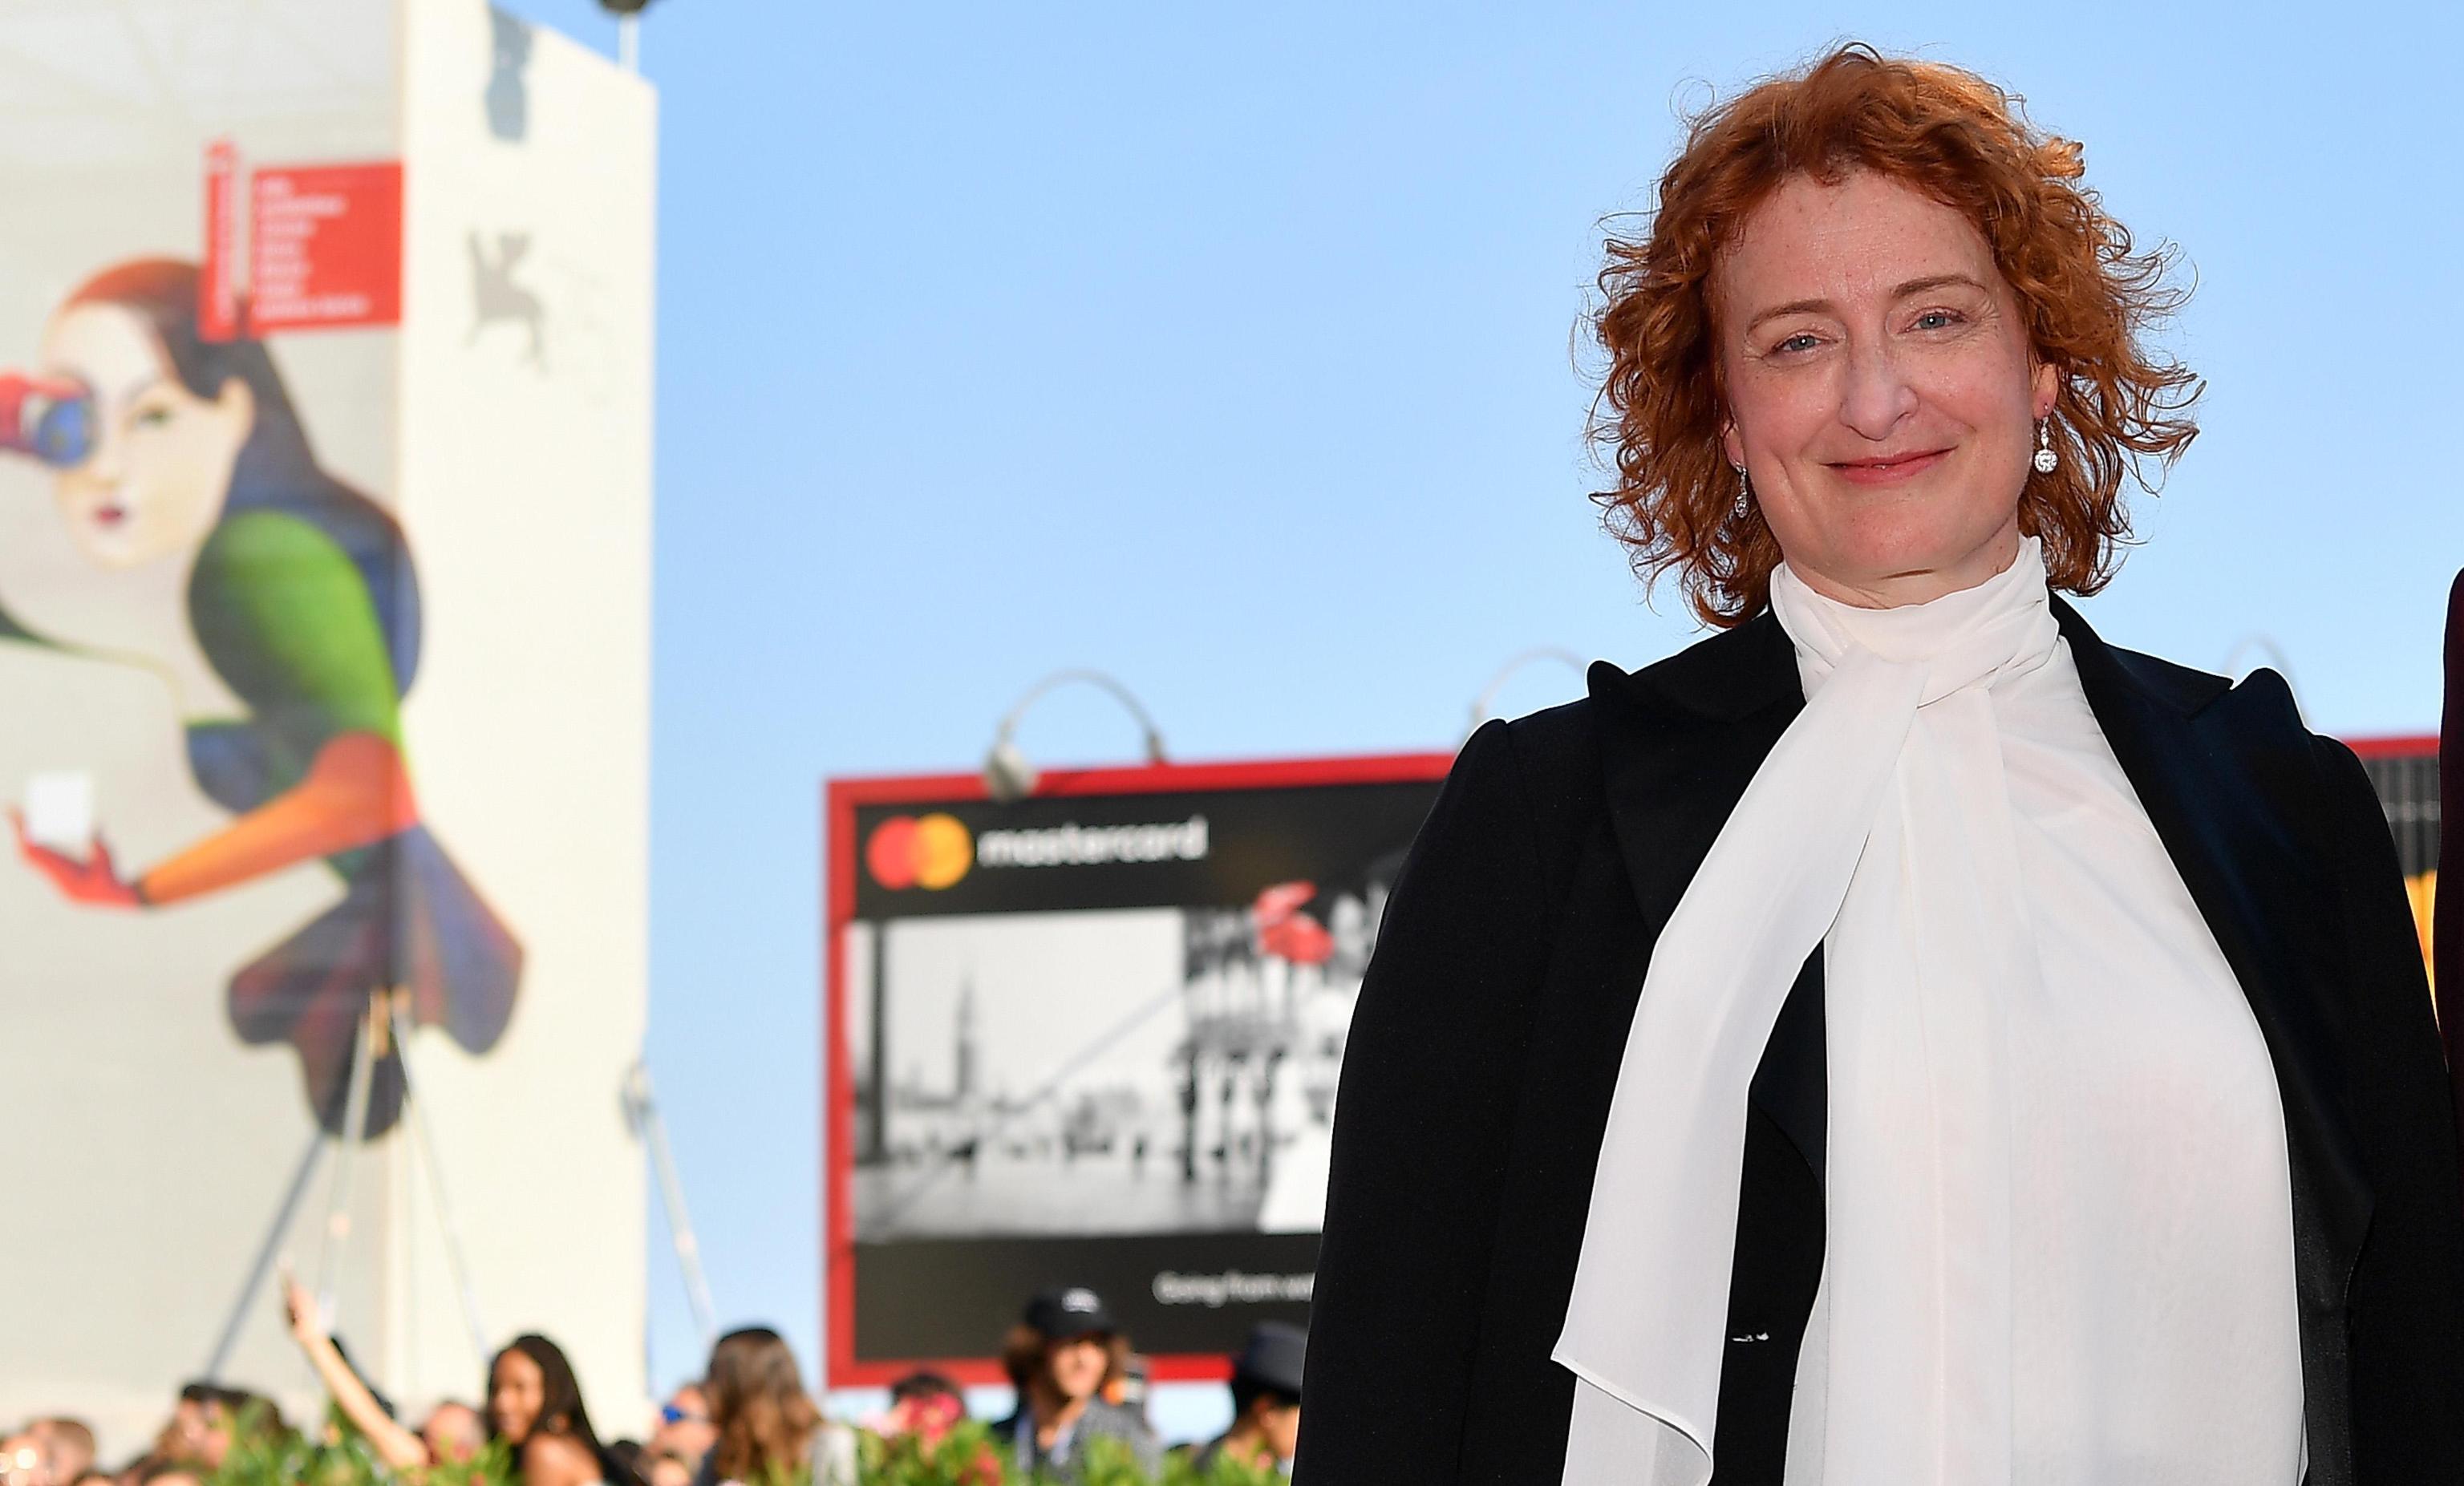 Jennifer Kent, giornalista insulta la regista: 'Vergogna put***a, fai schifo'